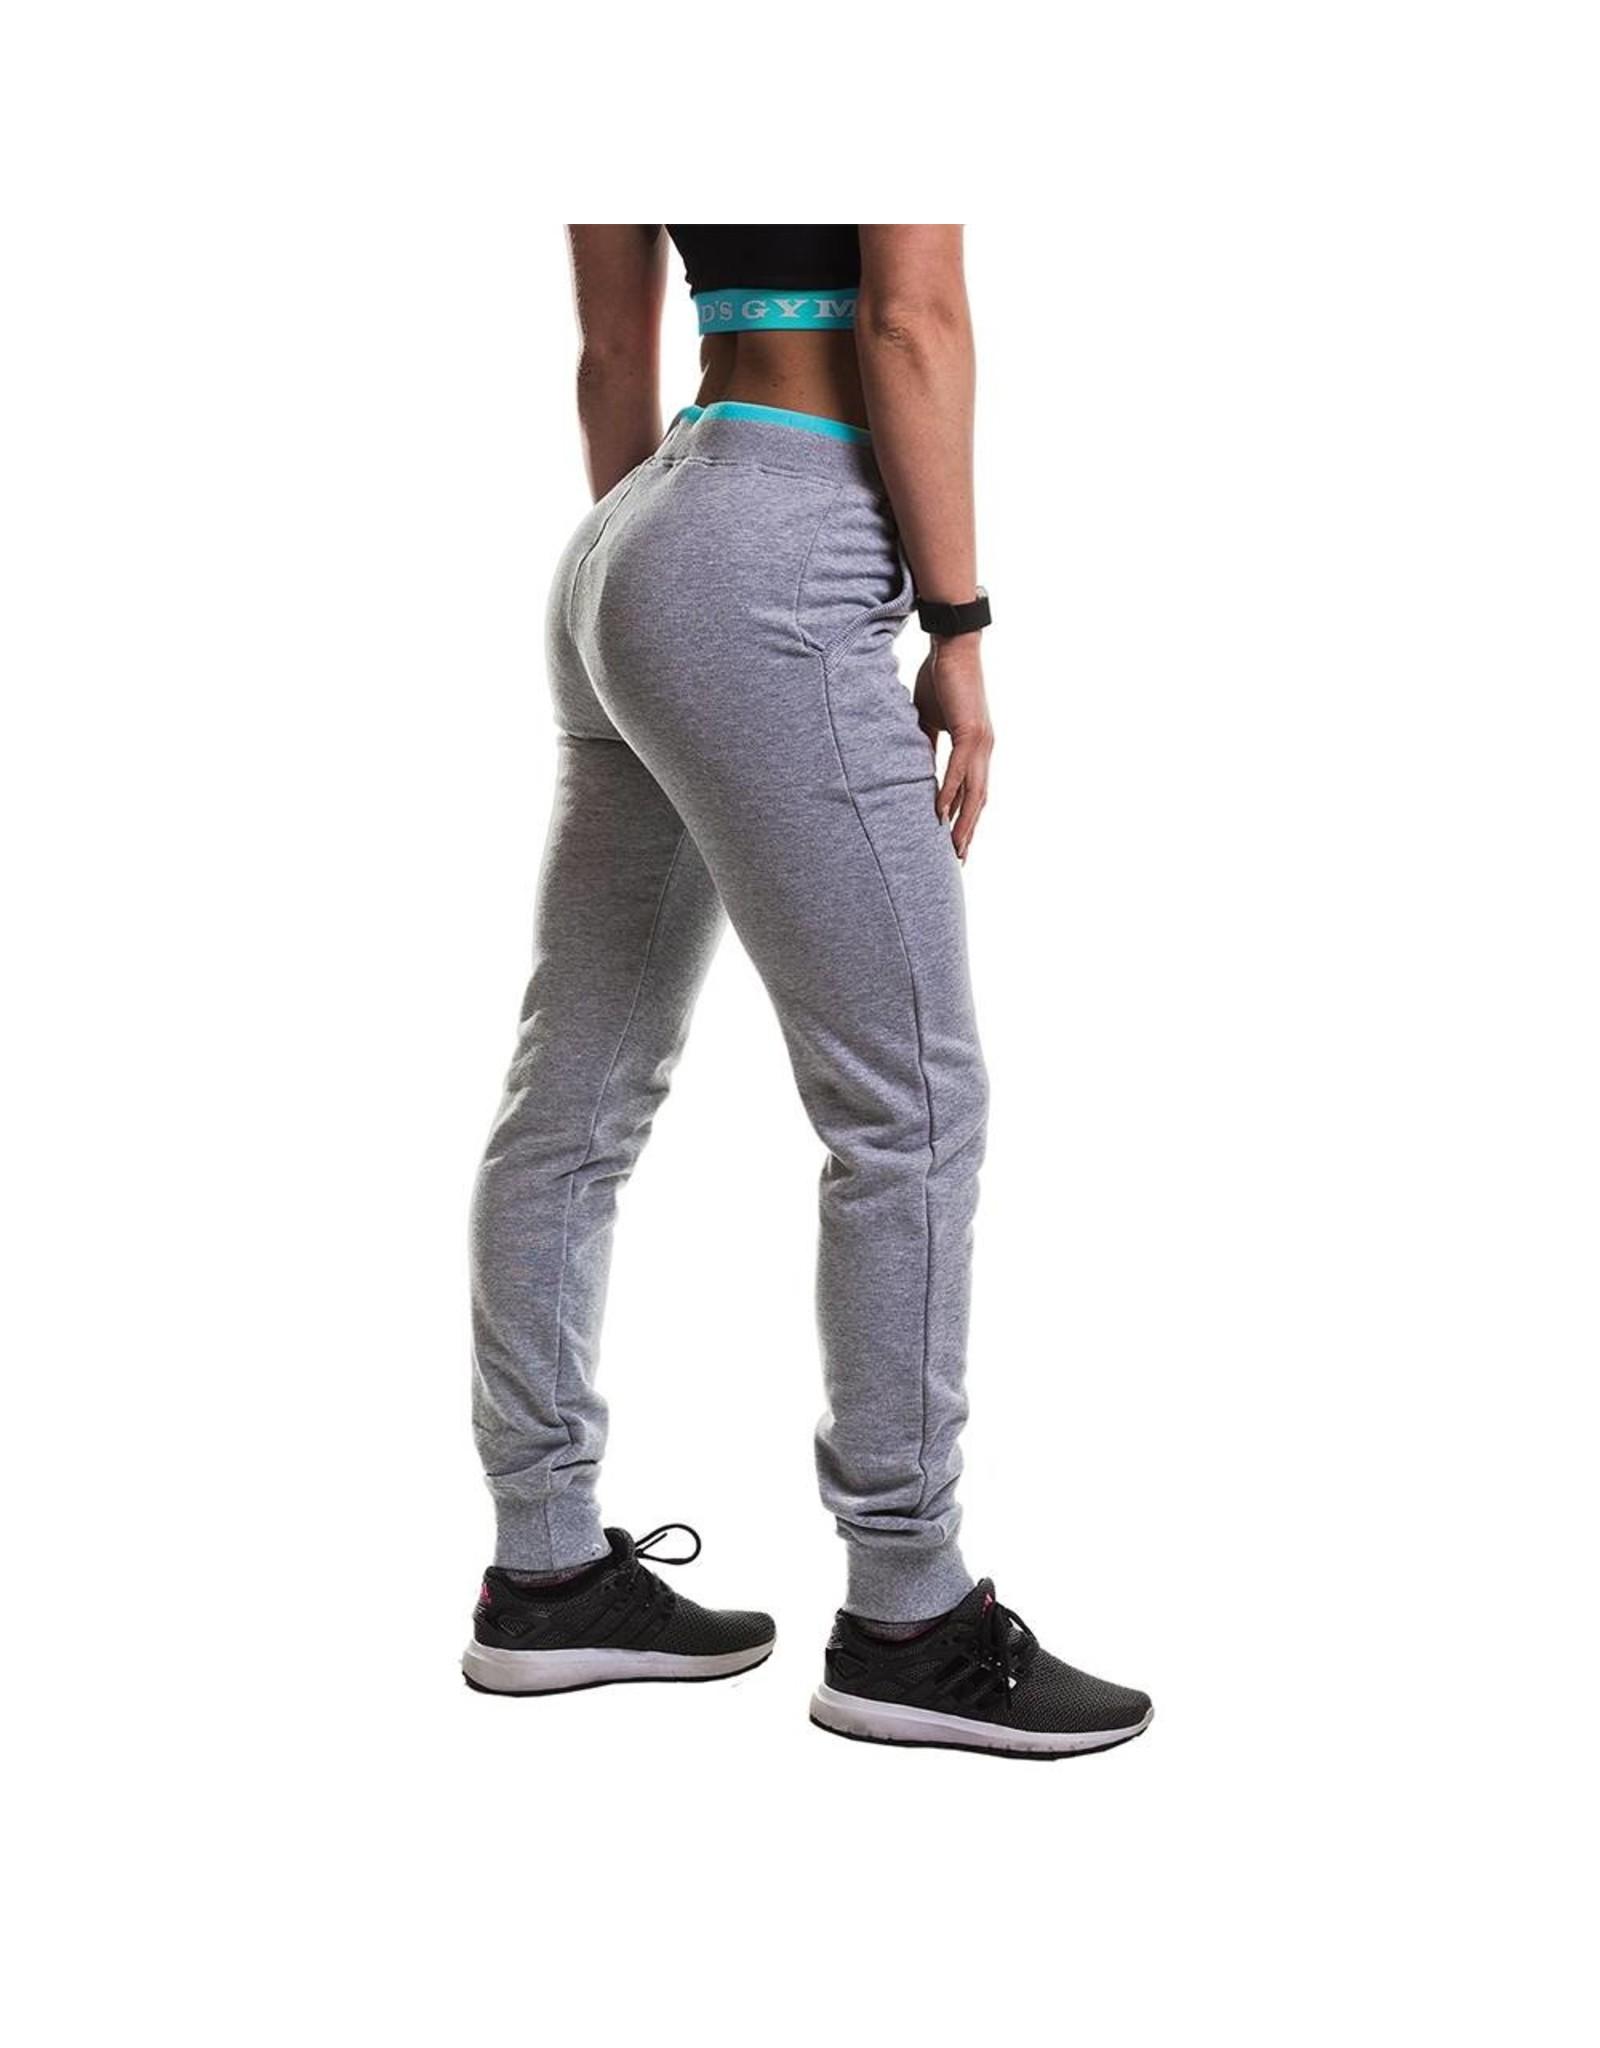 Gold's Gym Ladies Fitted Premium Jog Pants - Grey